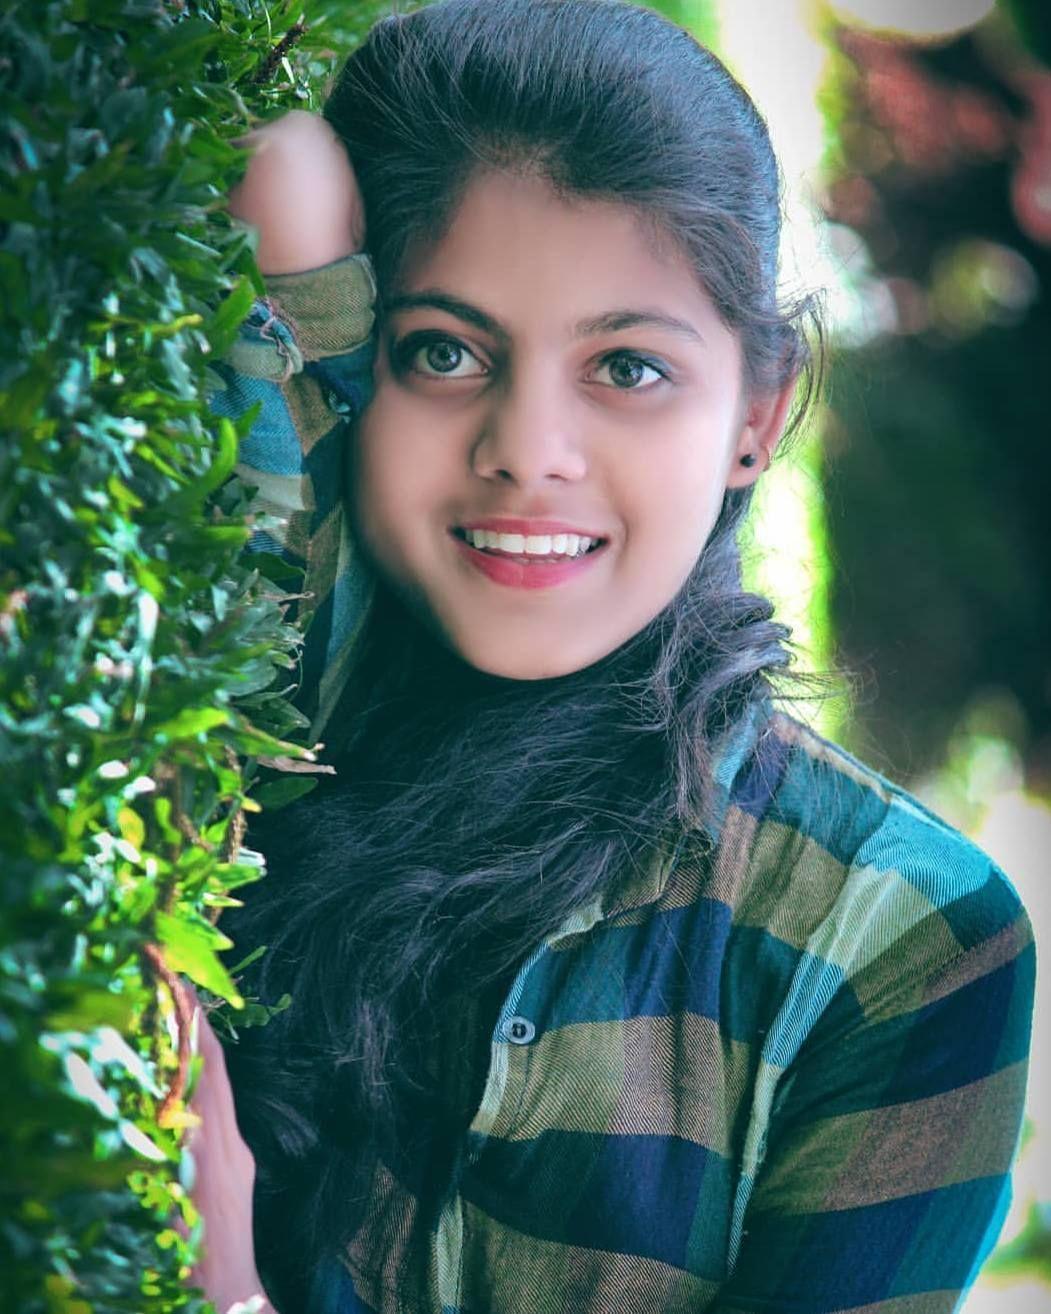 Free Images : plant, girl, flower, model, spring, red